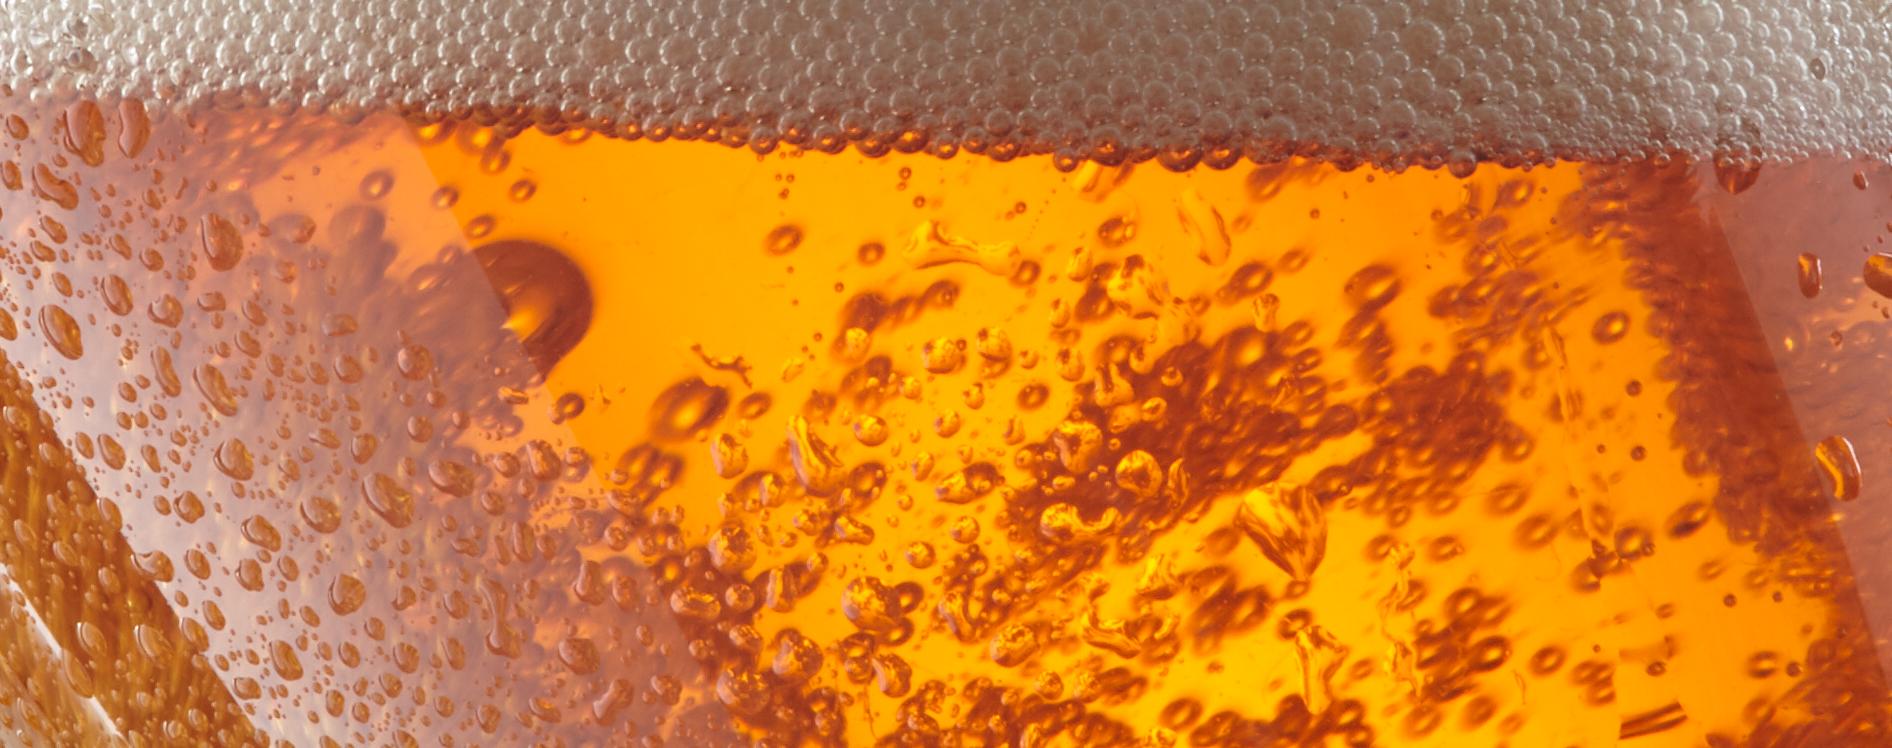 Bier 02